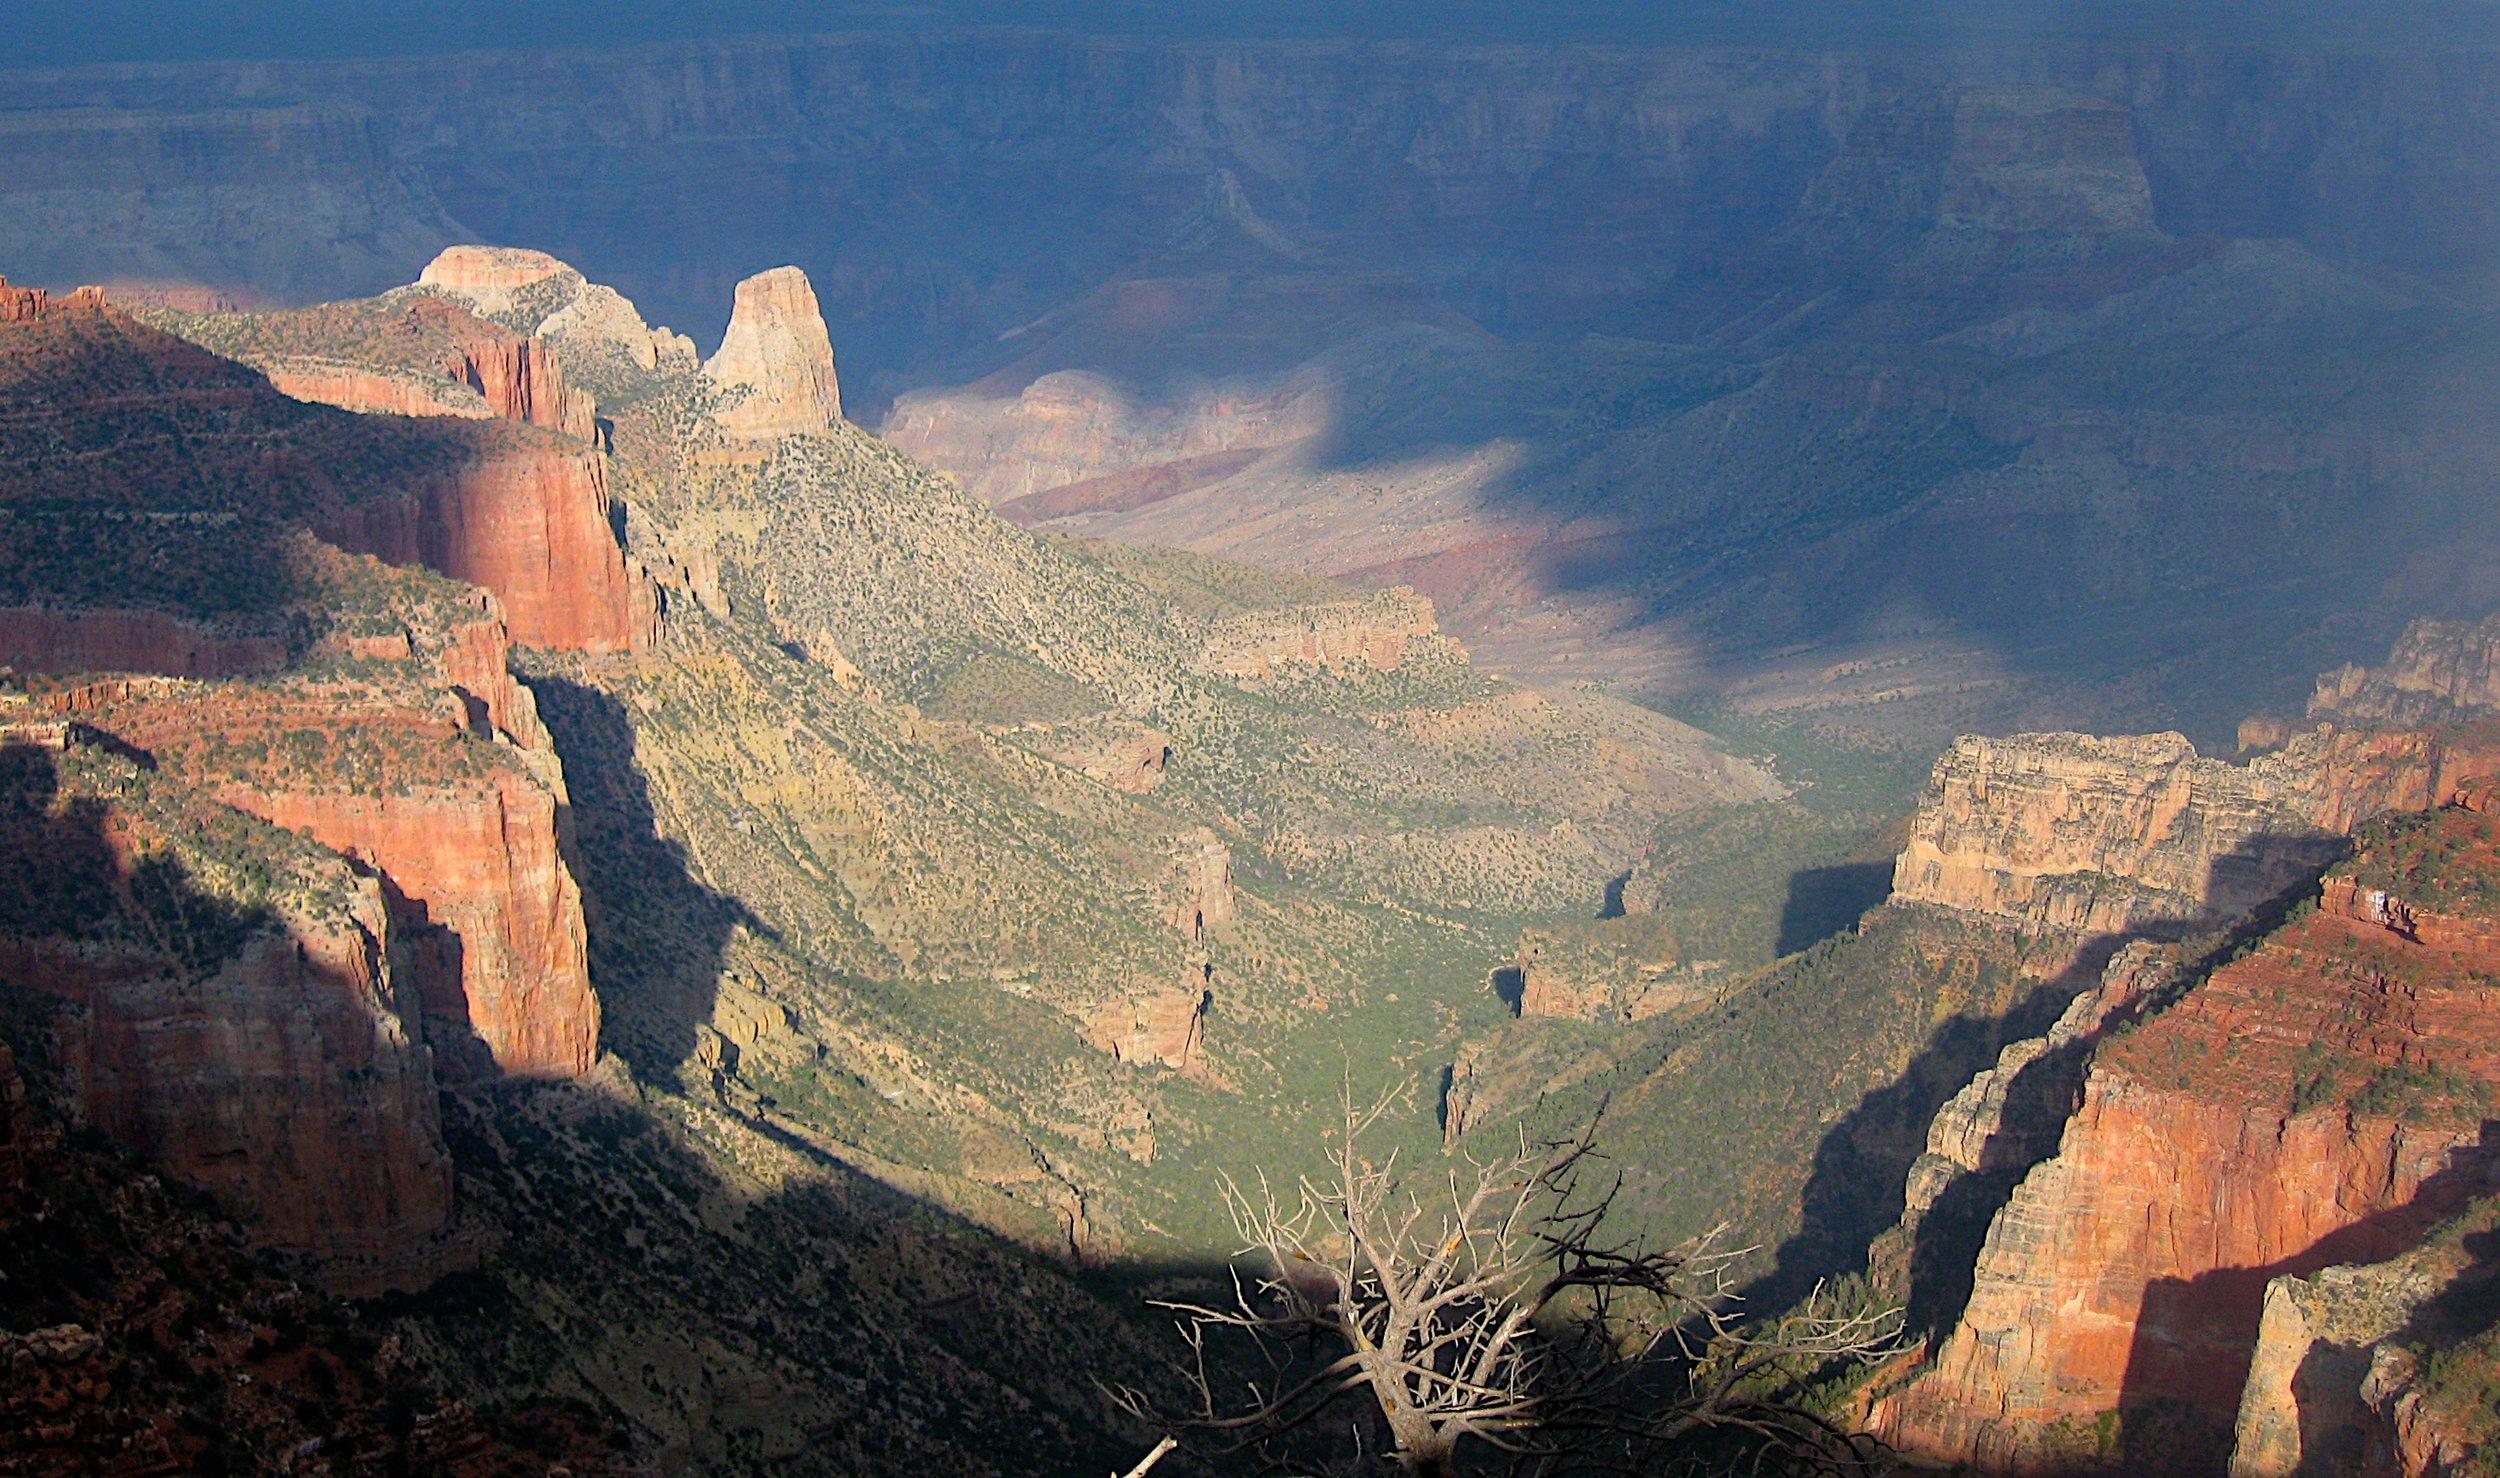 The Grand Canyon North Rim